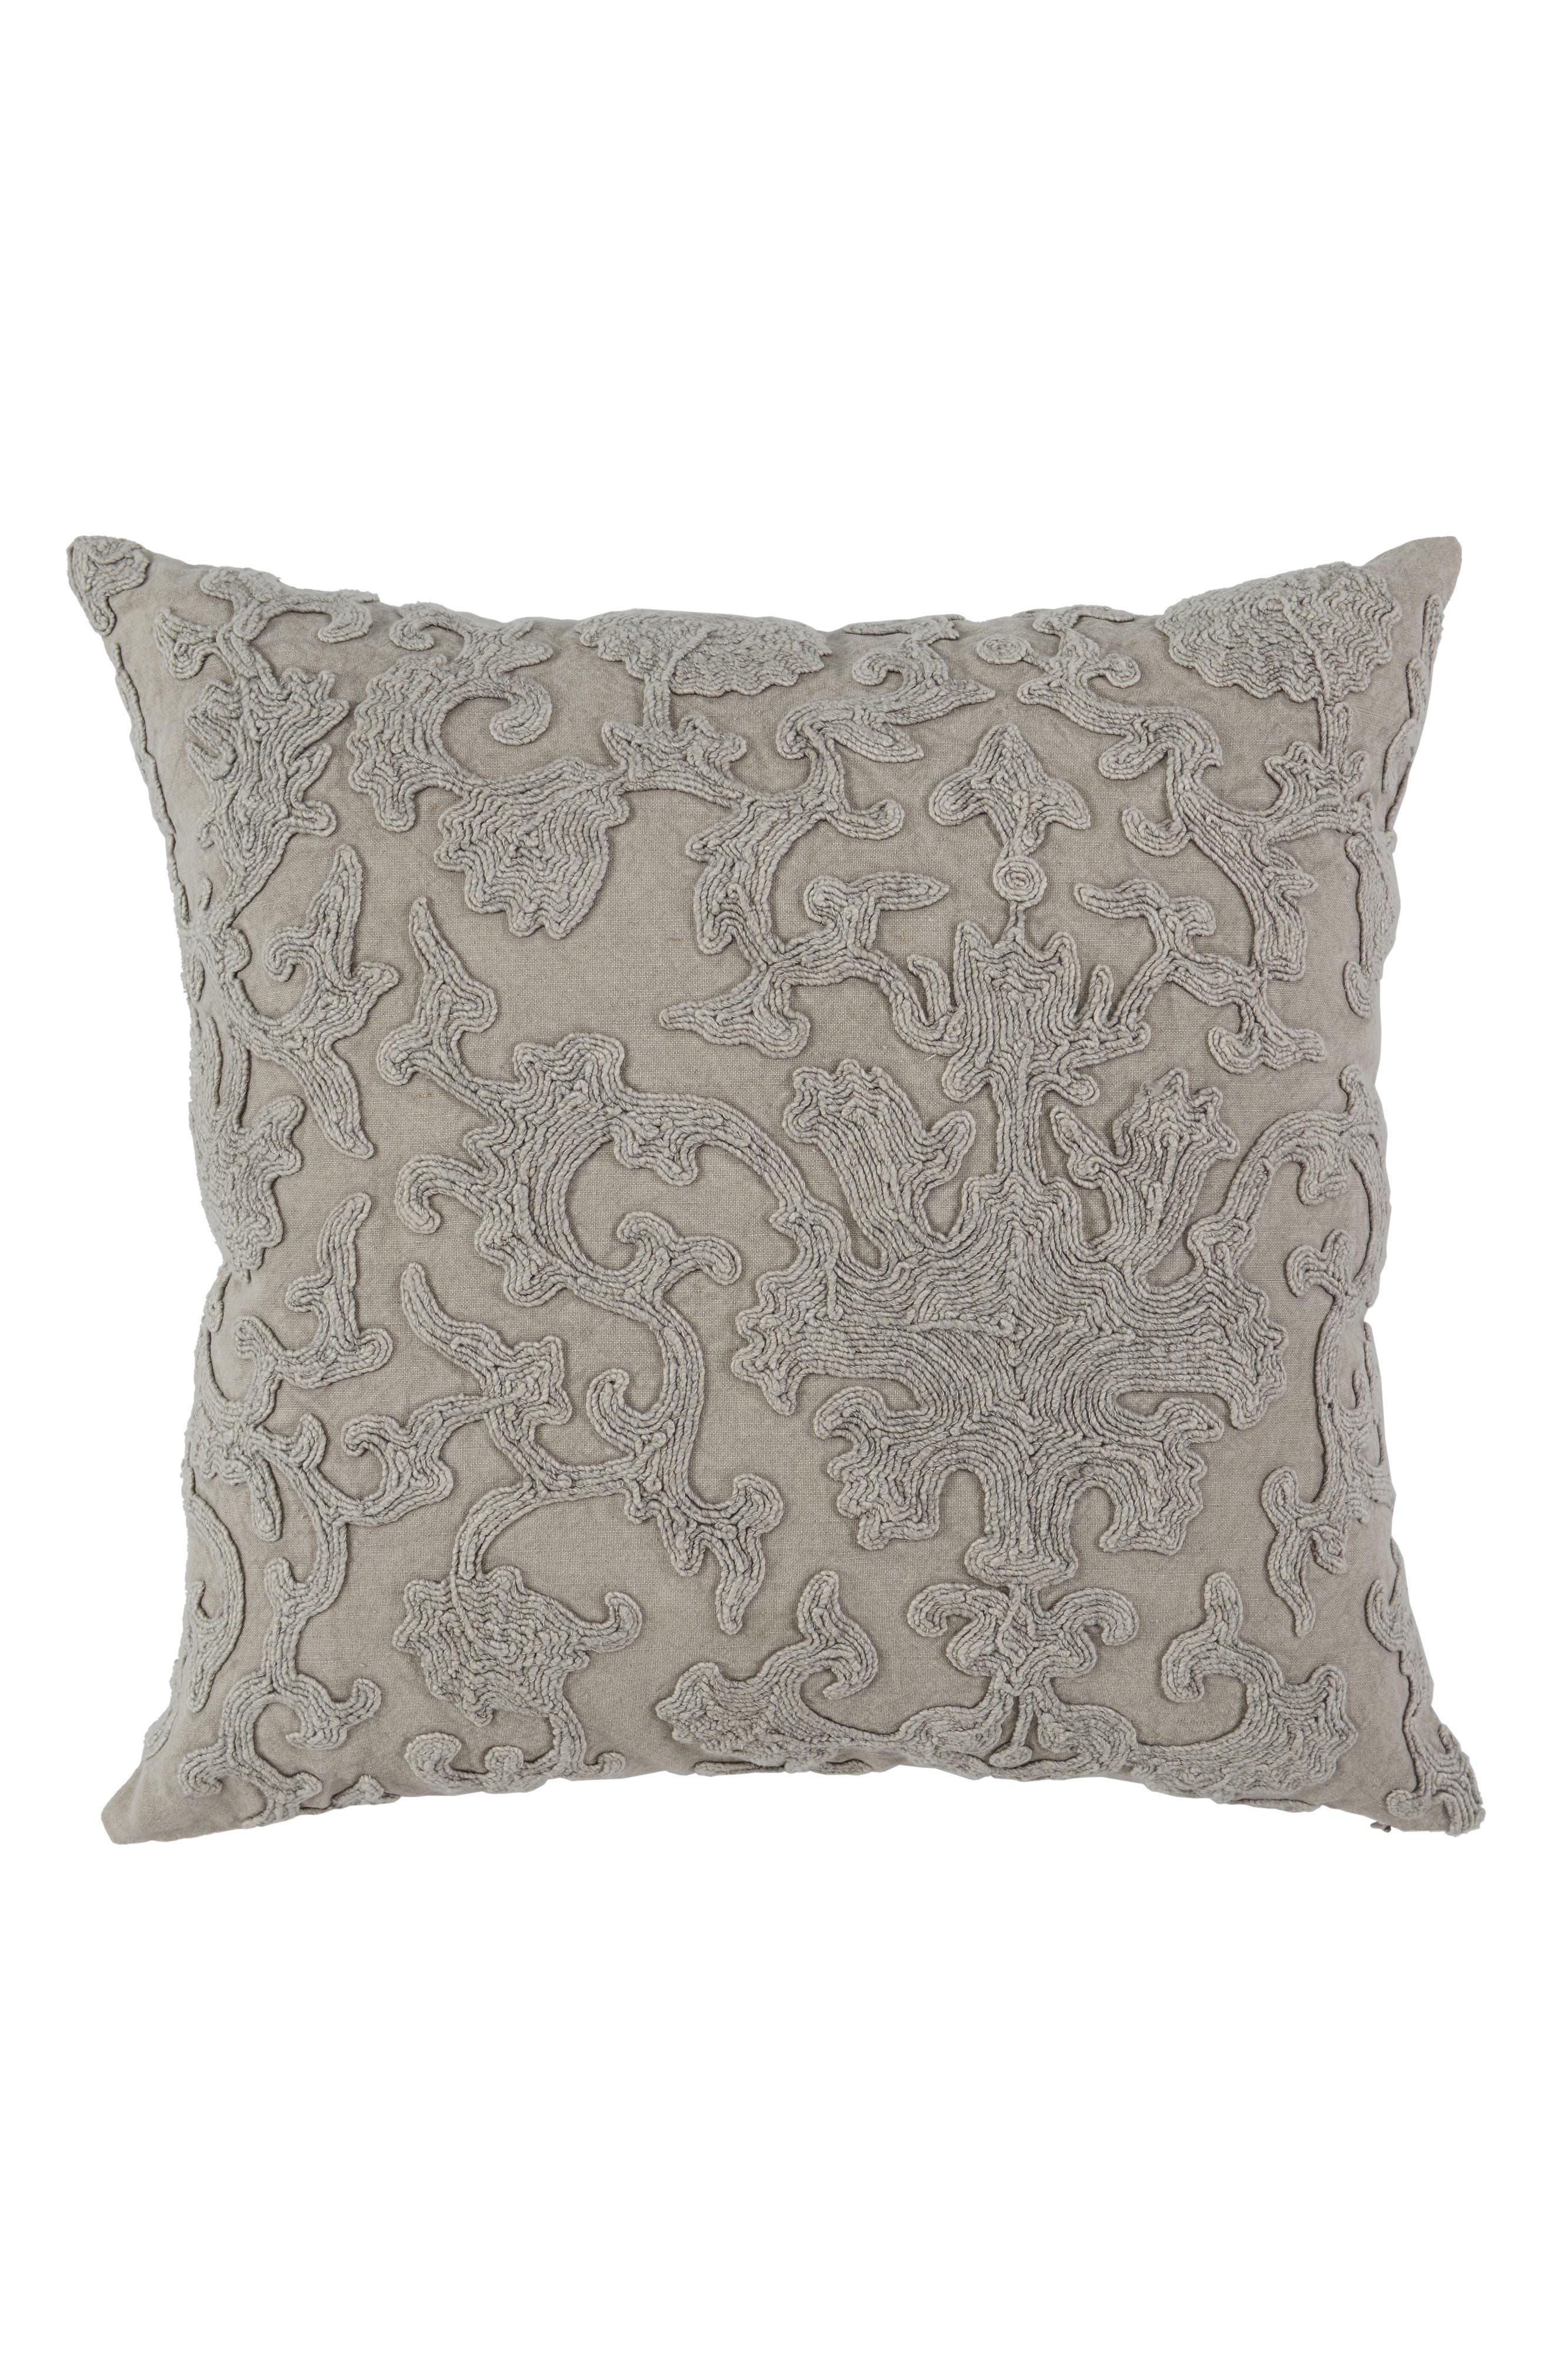 Portia Linen Accent Pillow,                         Main,                         color, NATURAL